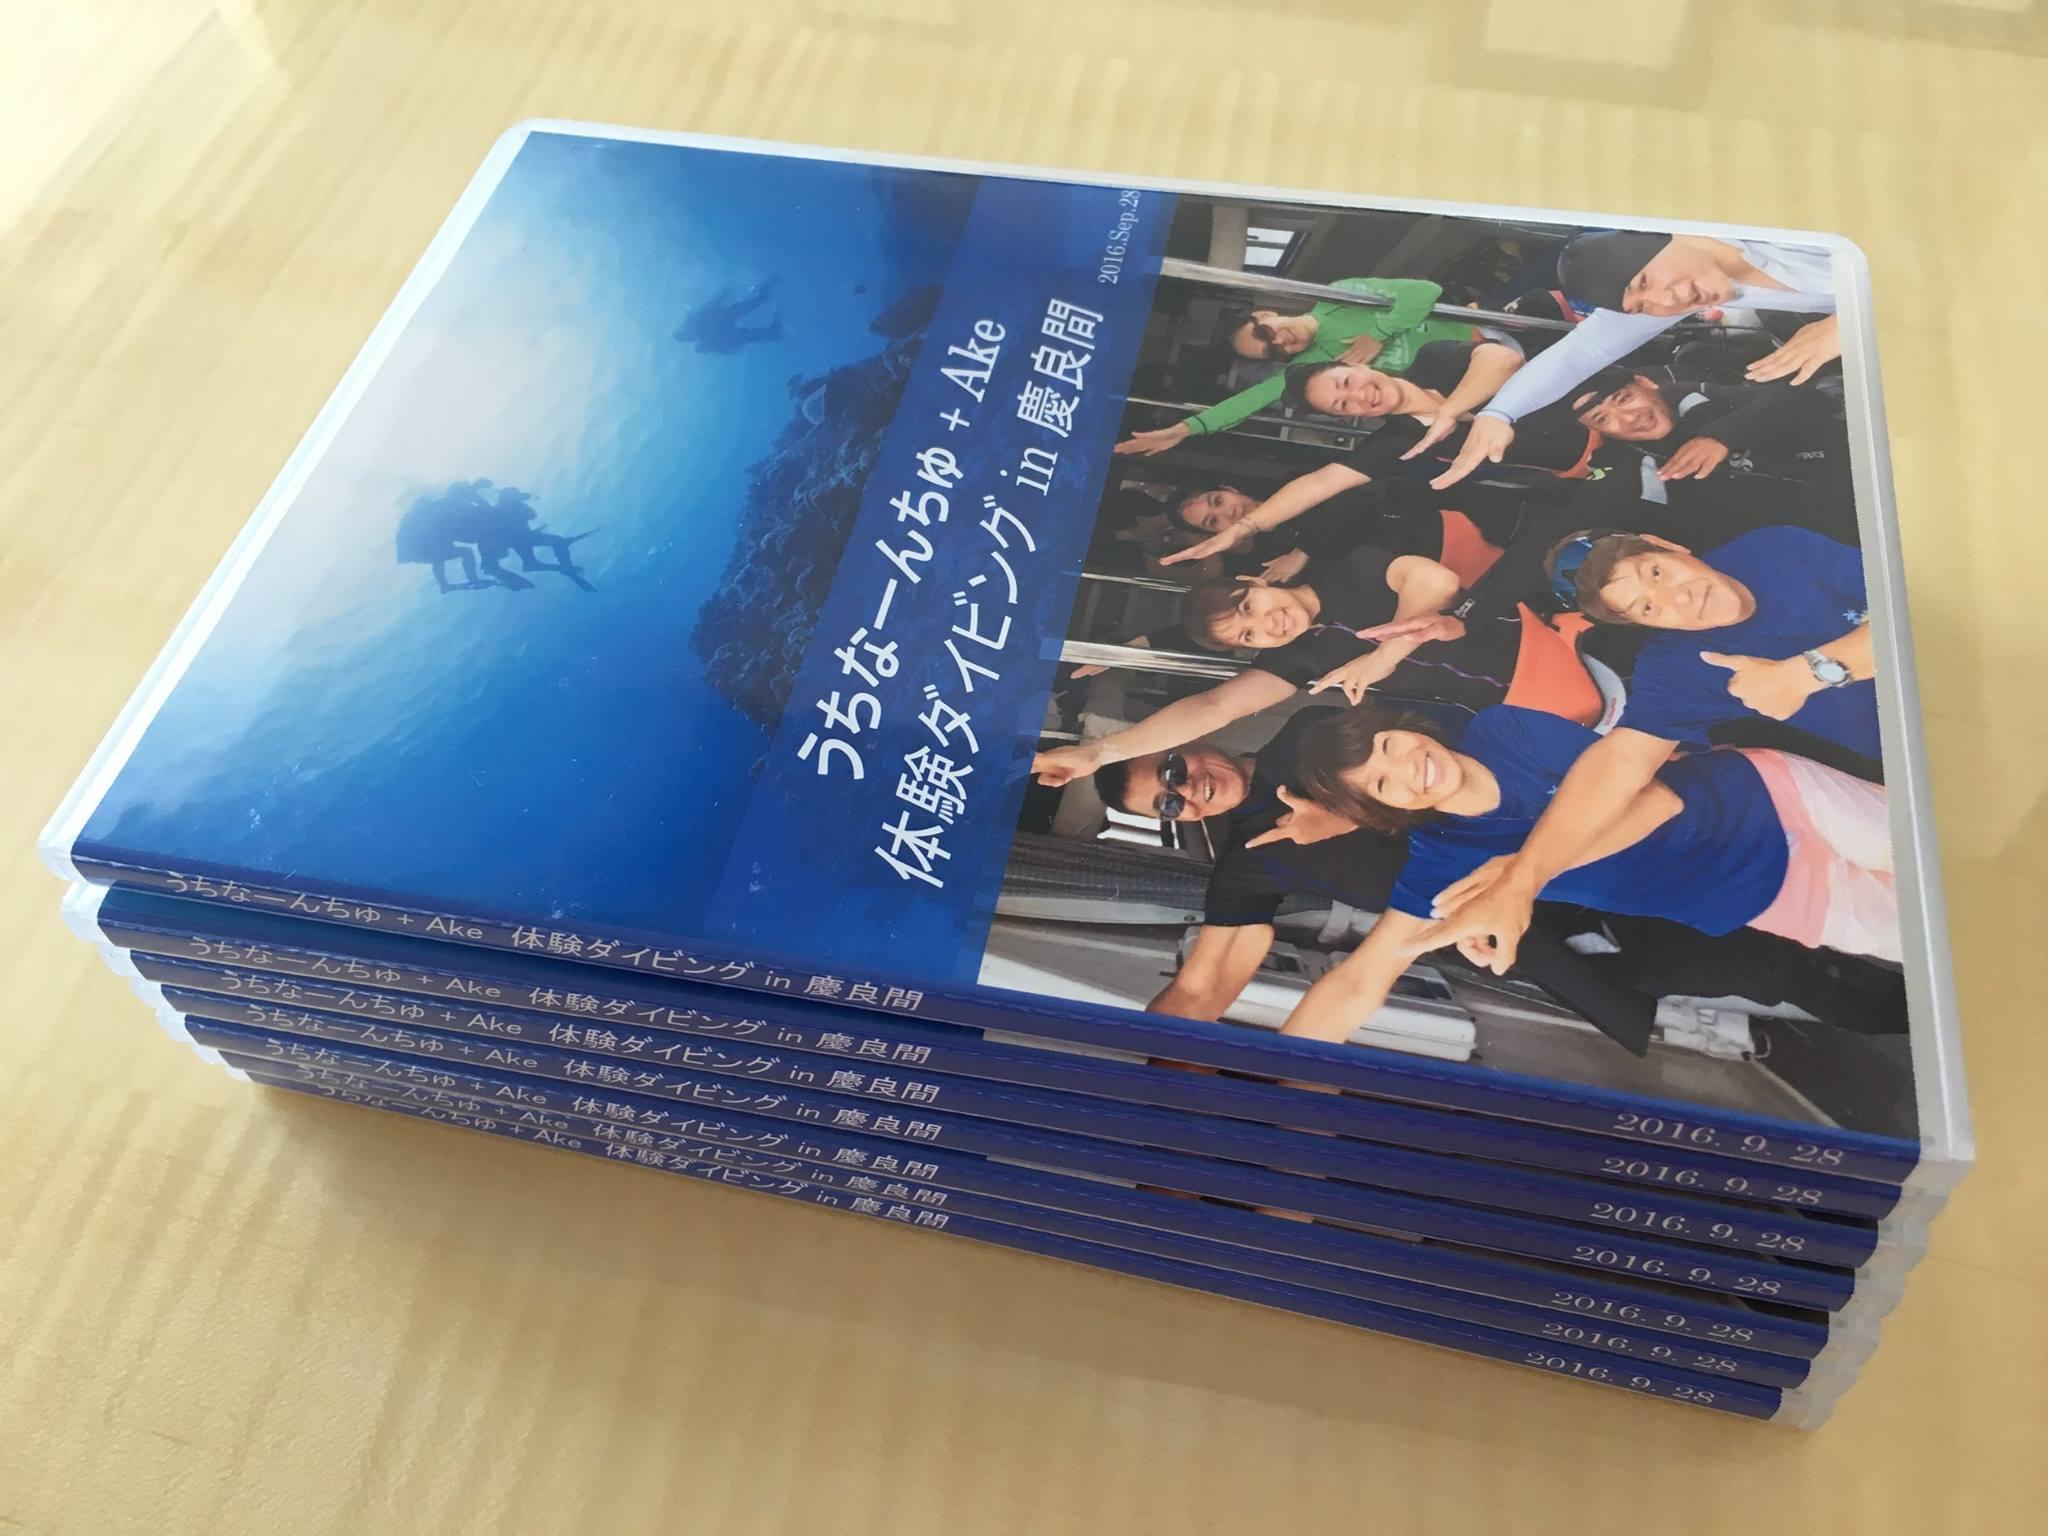 JK-Wave_スキューバダイビング_メモリアルDVD010.jpg